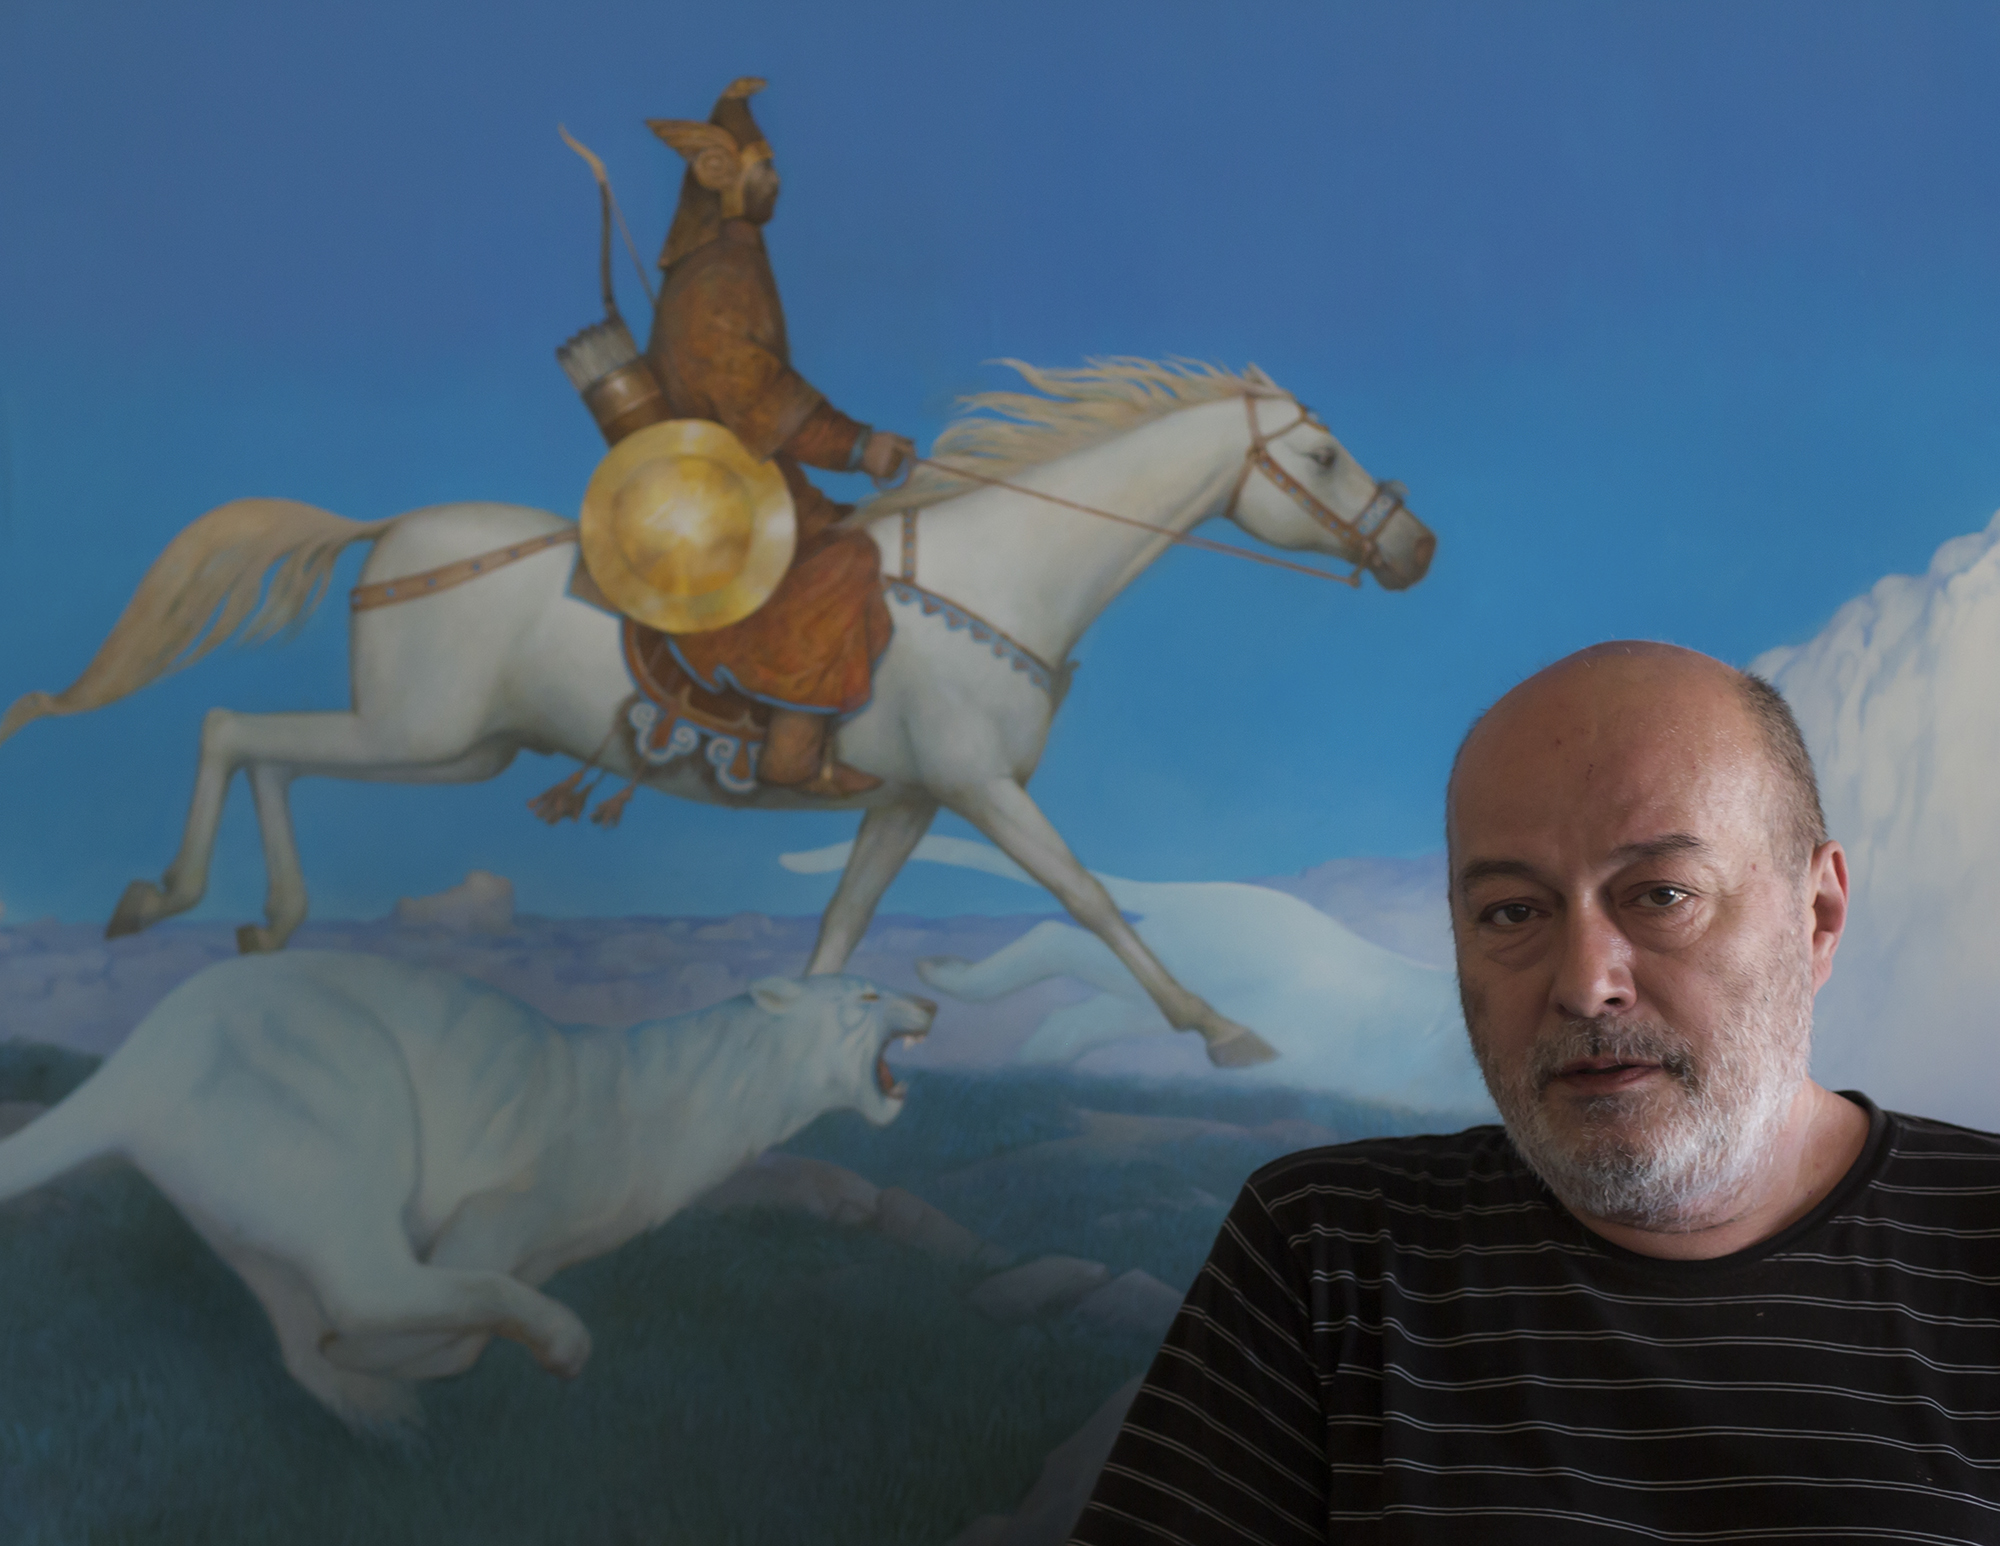 Азат Миннекаев на фоне работы Охота Тенгри с небесными тиграми. 2010. Холст, акрил, темпера. 80х140 см. Коллекция Фонда Марджани.JPG